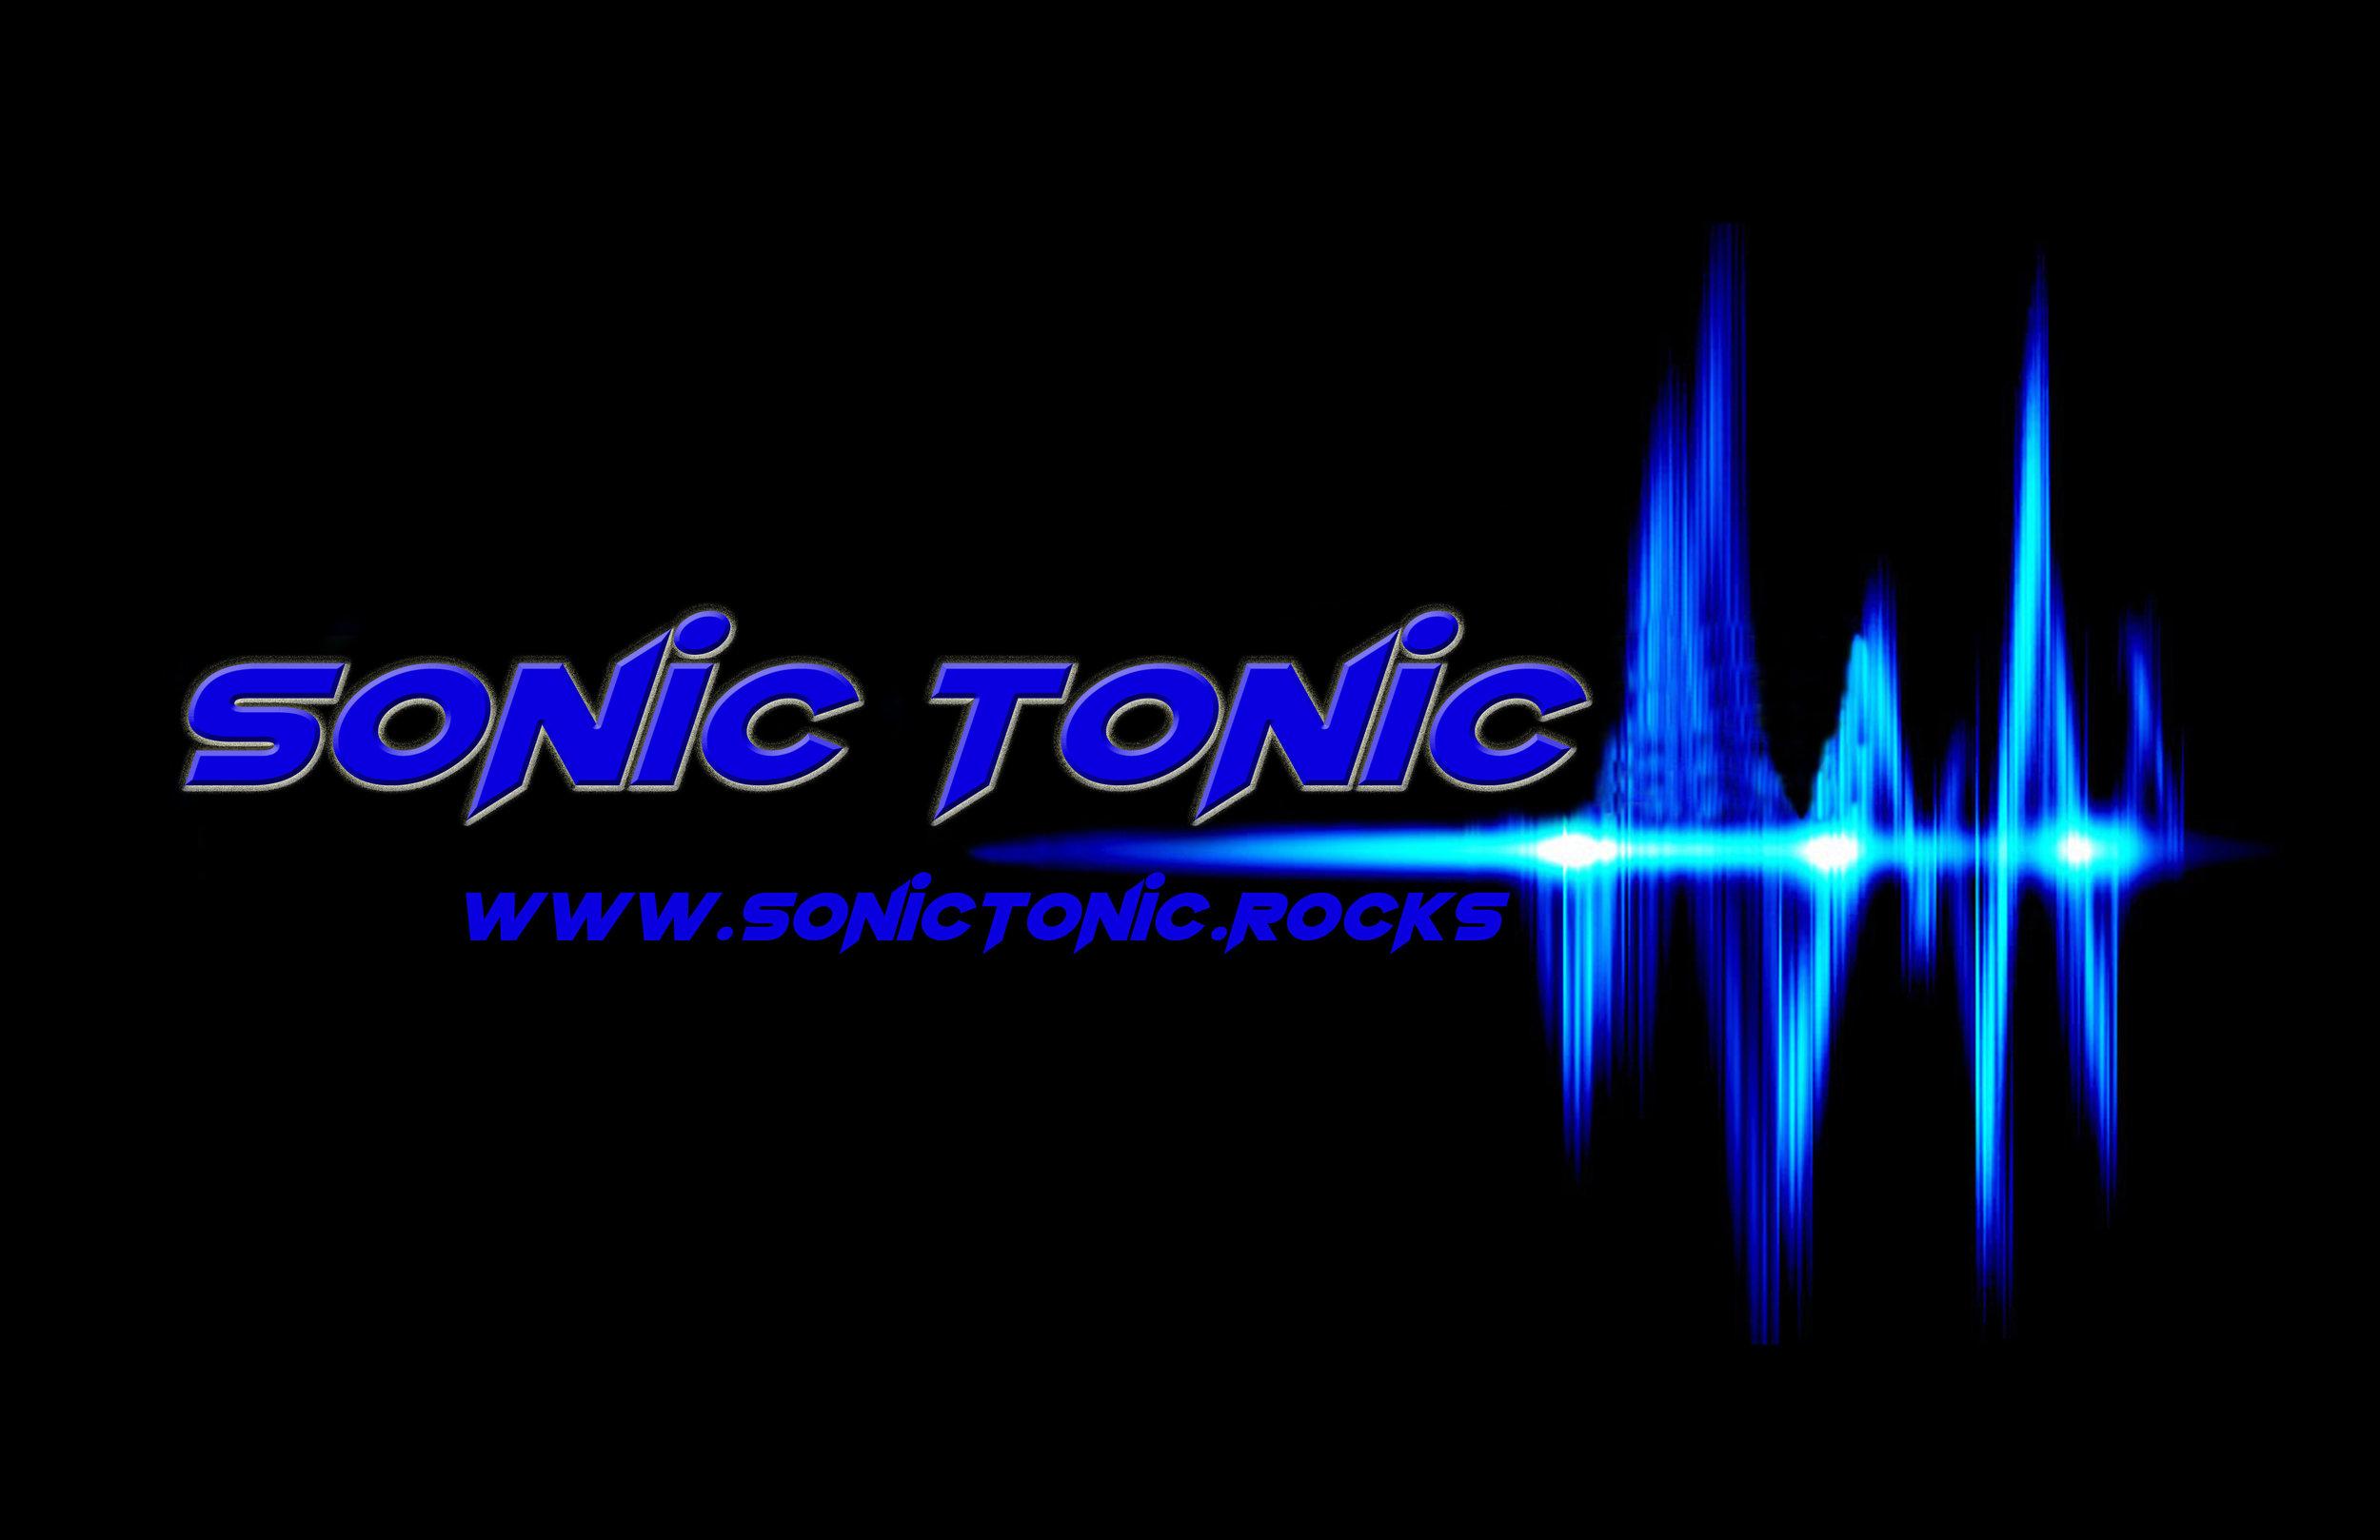 Sonictoniclogo_banner copy - Copy (3).jpg